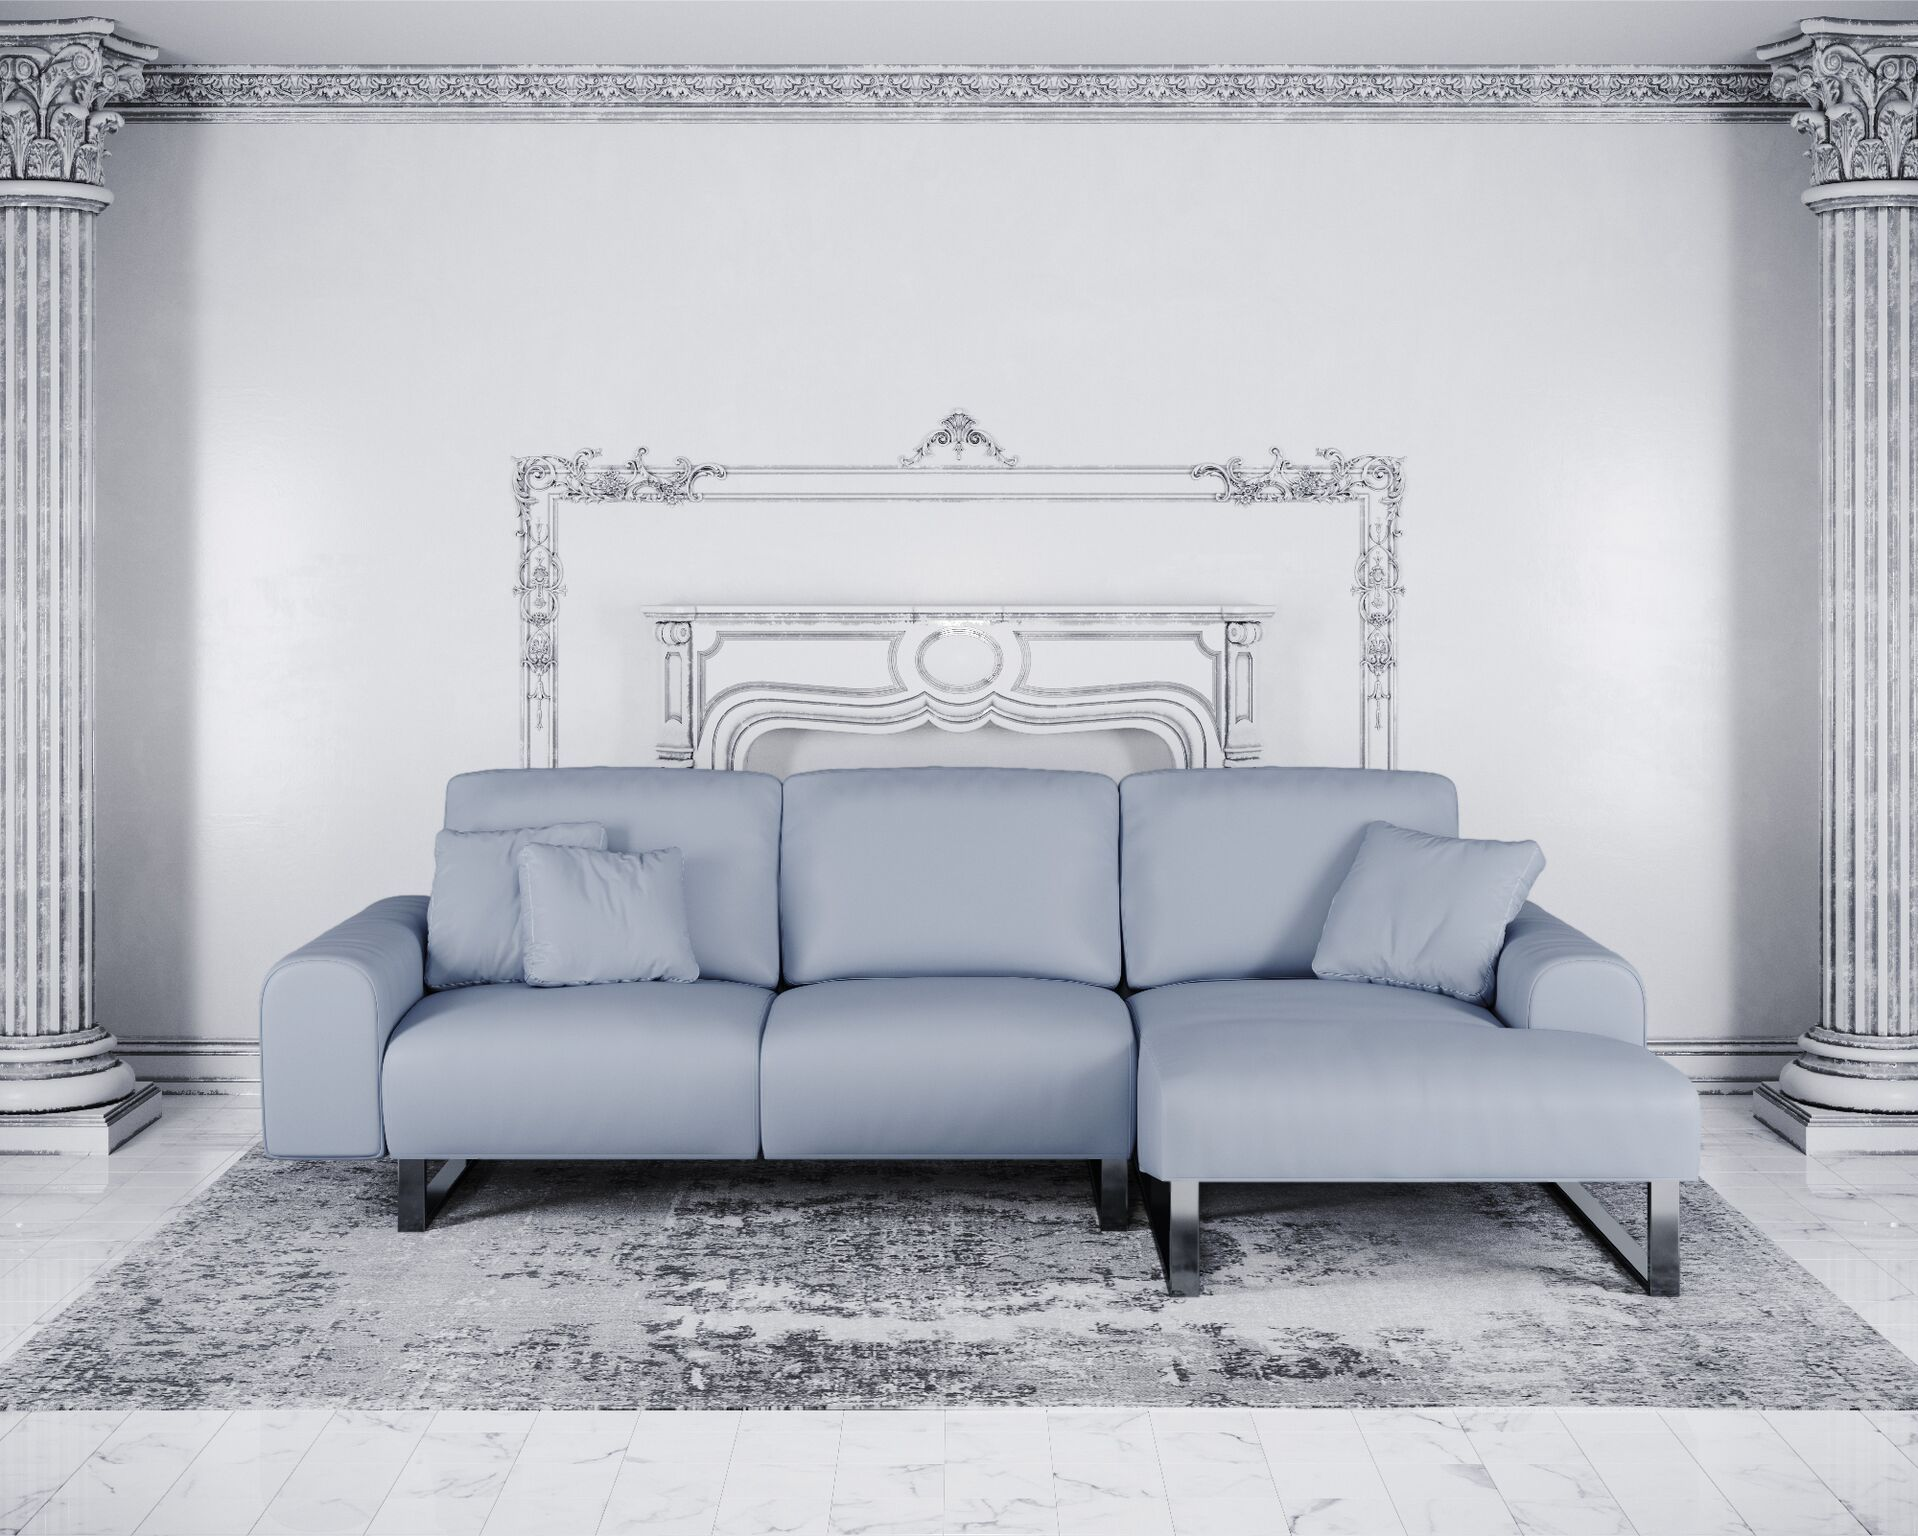 Buy Reflex Leather Corner Sofa Online London